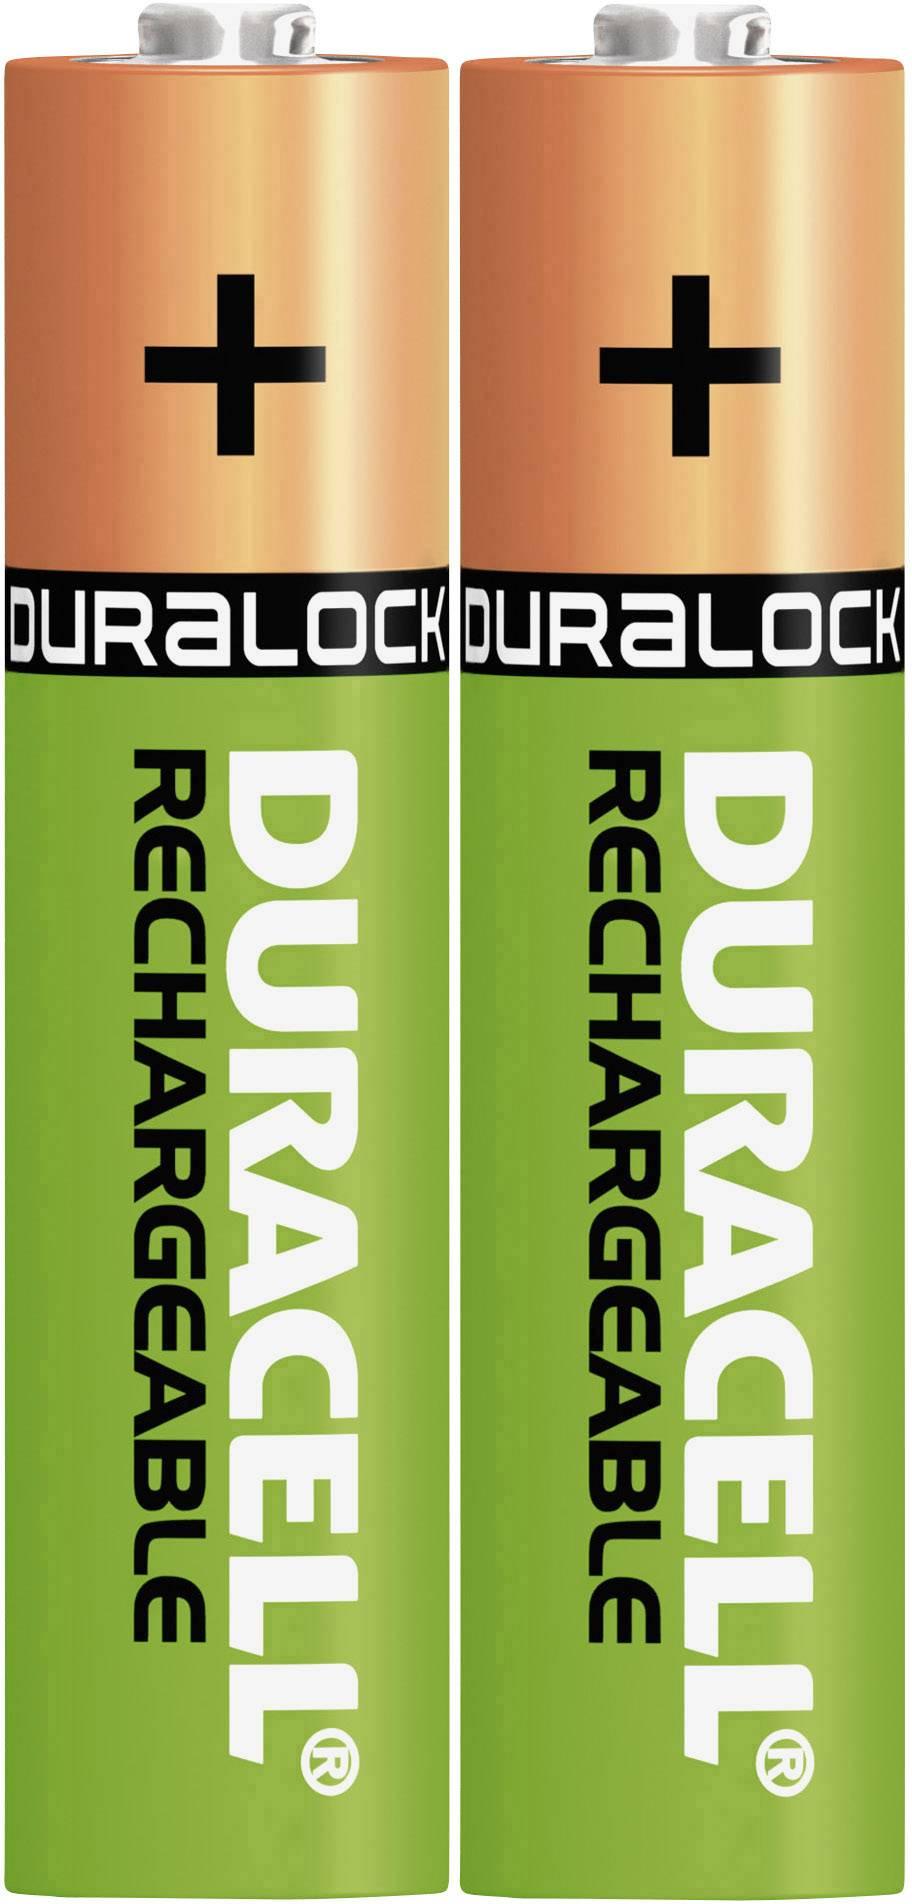 Mikrotužkový akumulátor typu AAA NiMH Duracell StayCharged HR03 DUR203815, 800 mAh, 1.2 V, 2 ks